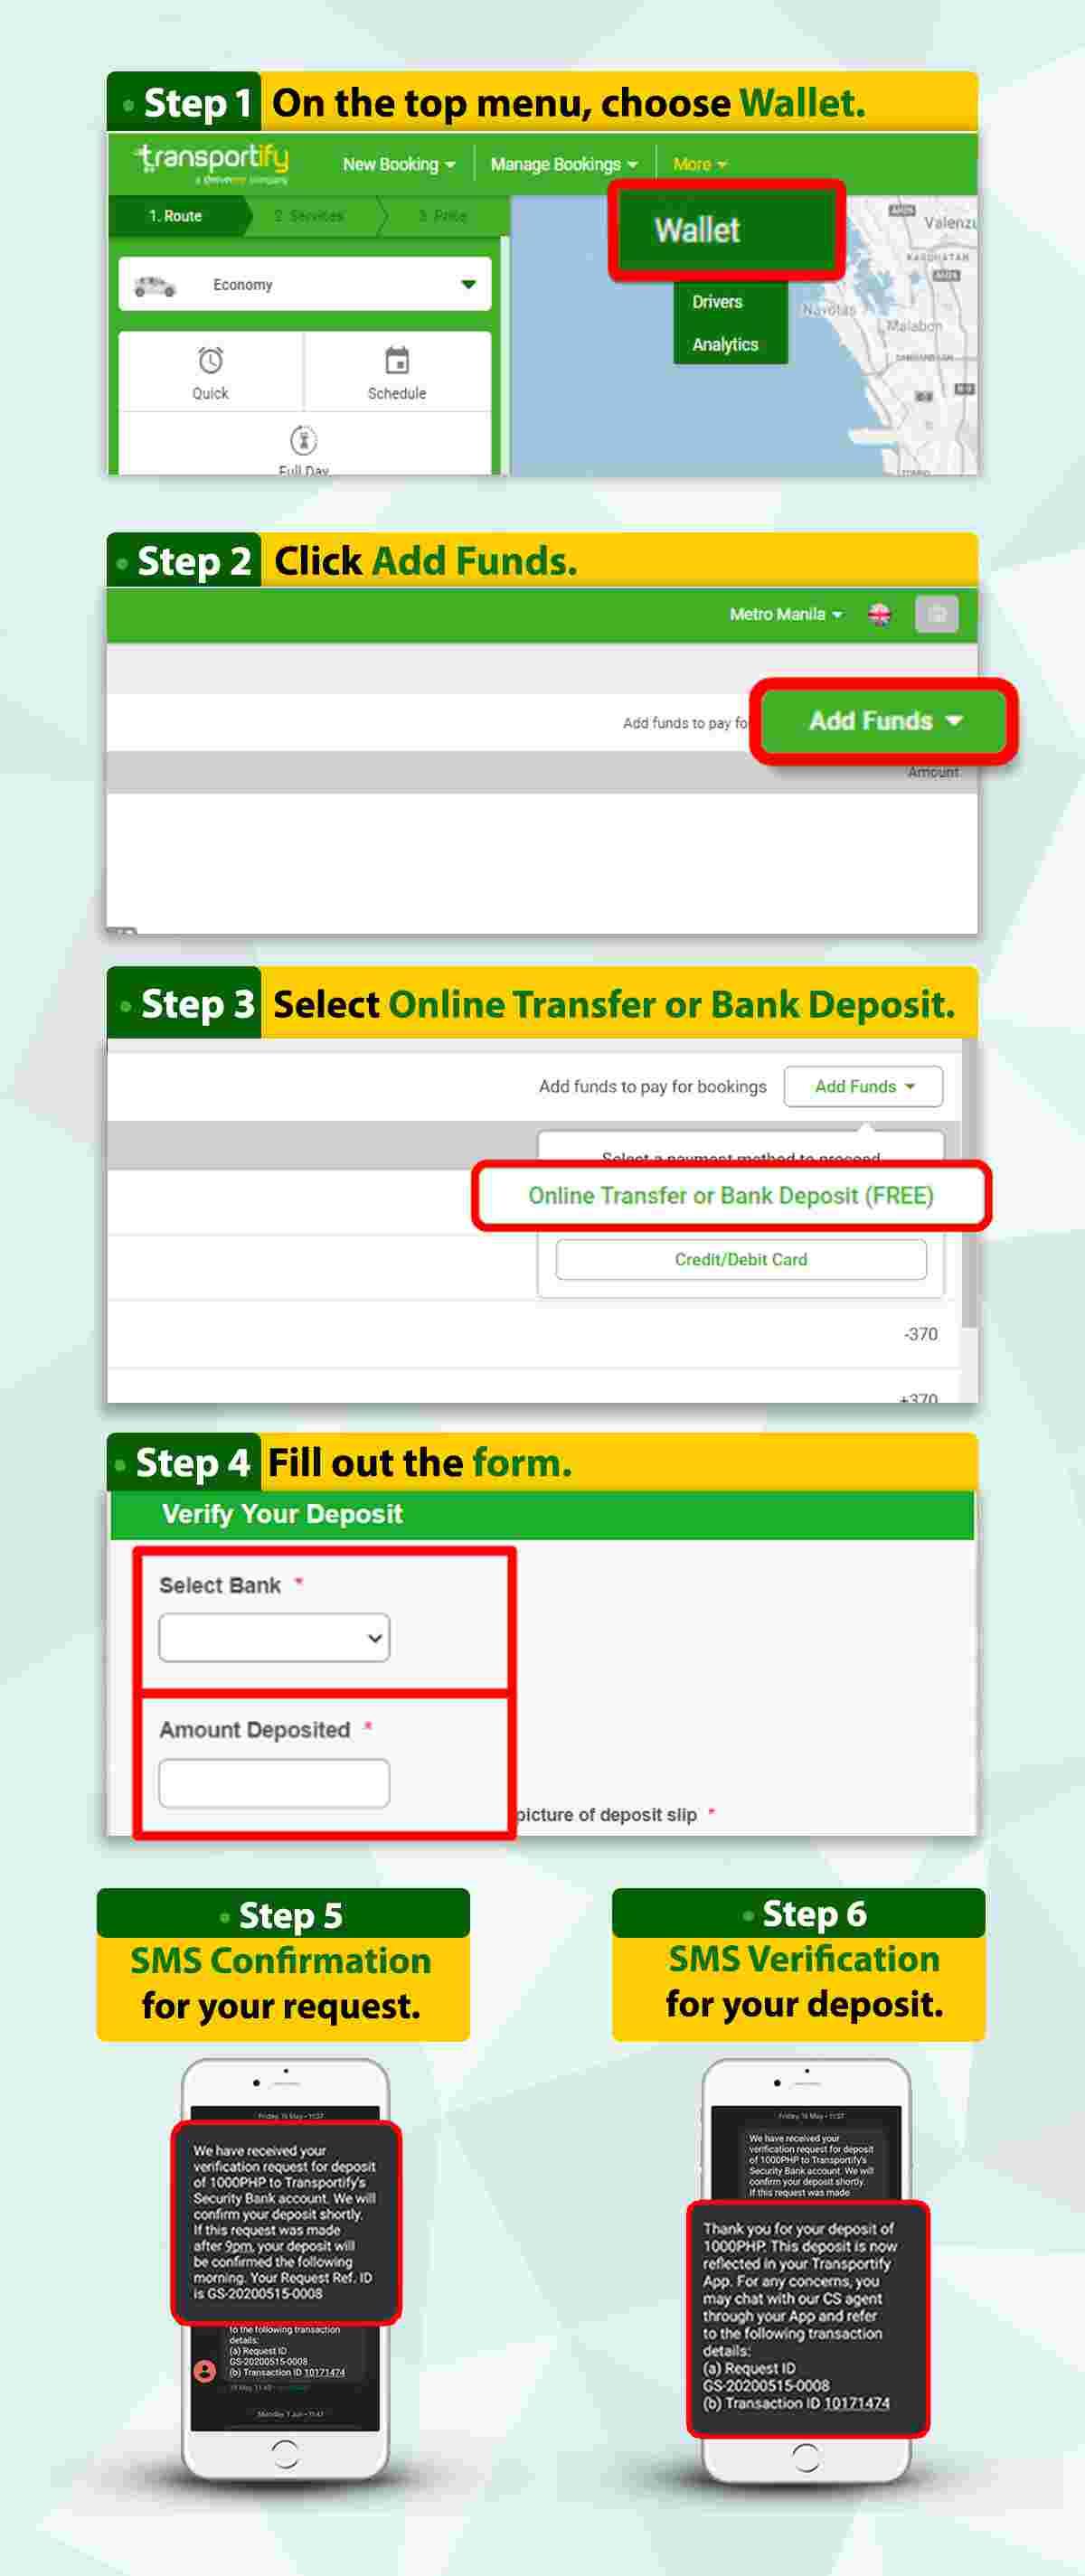 No Fee Add Funds via Bank Transfer